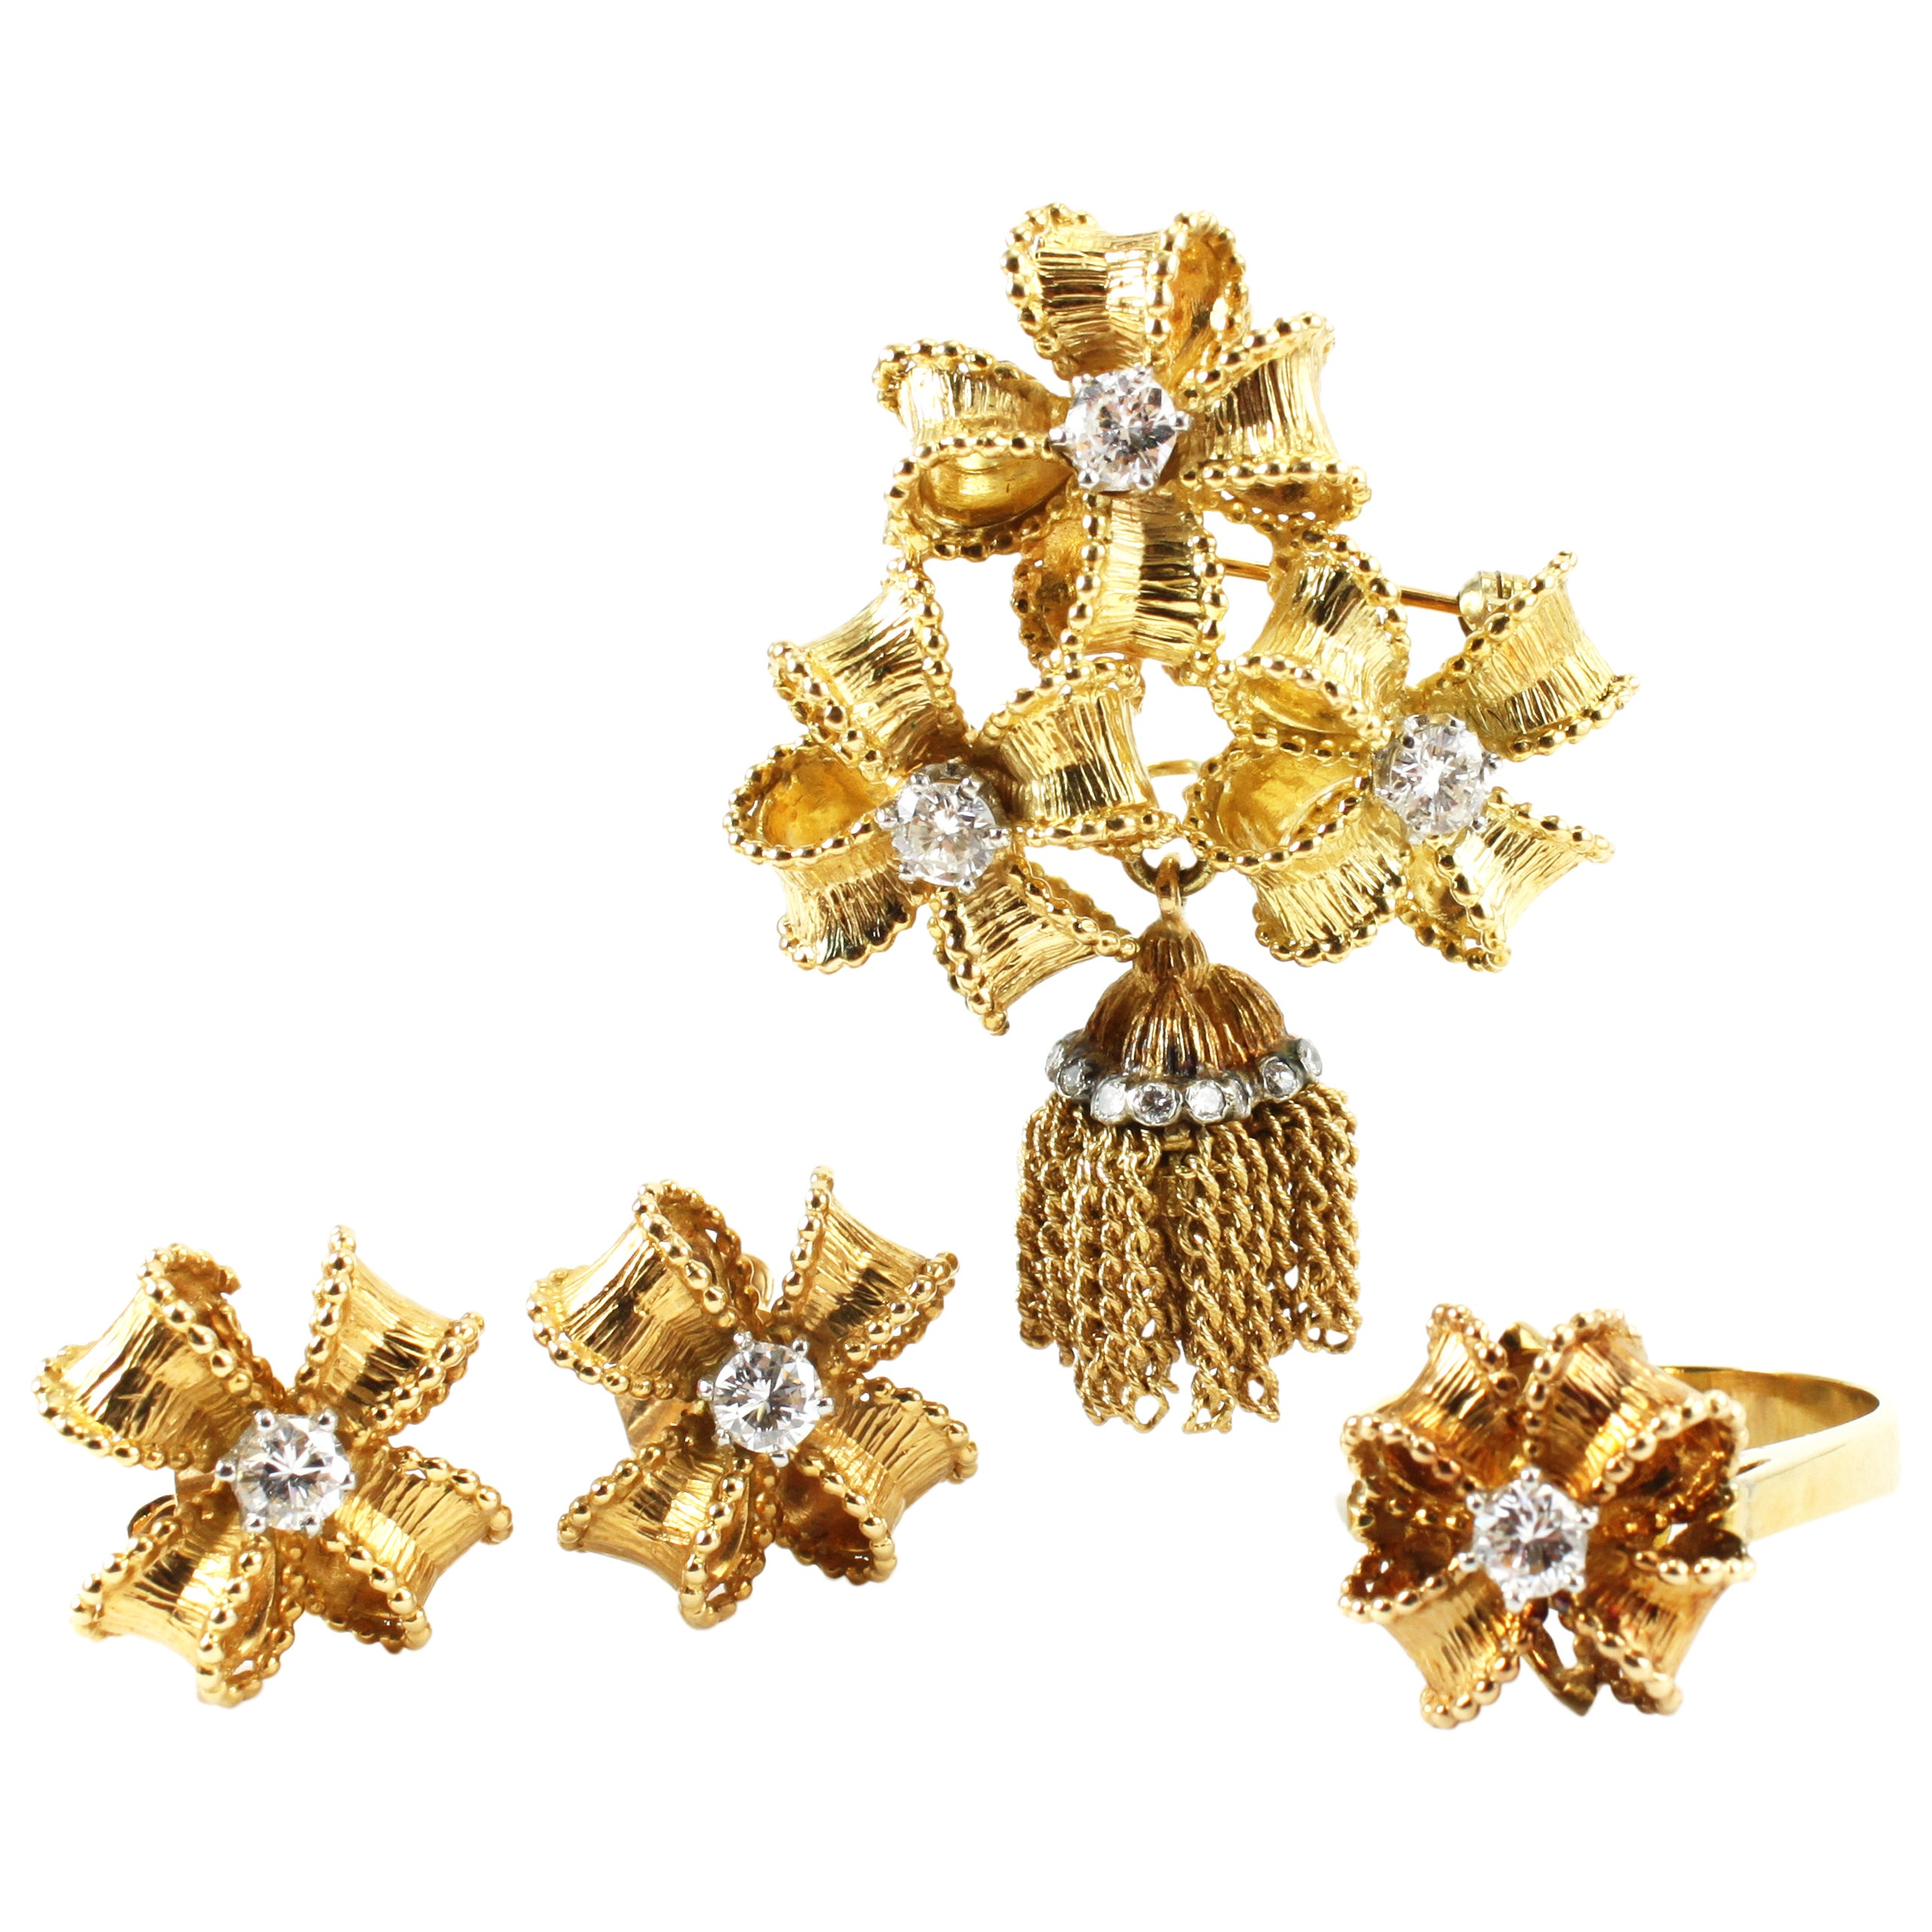 Tiffany & Co. Diamond 18 Karat Yellow Gold Pendant Brooch Earrings and Ring Set